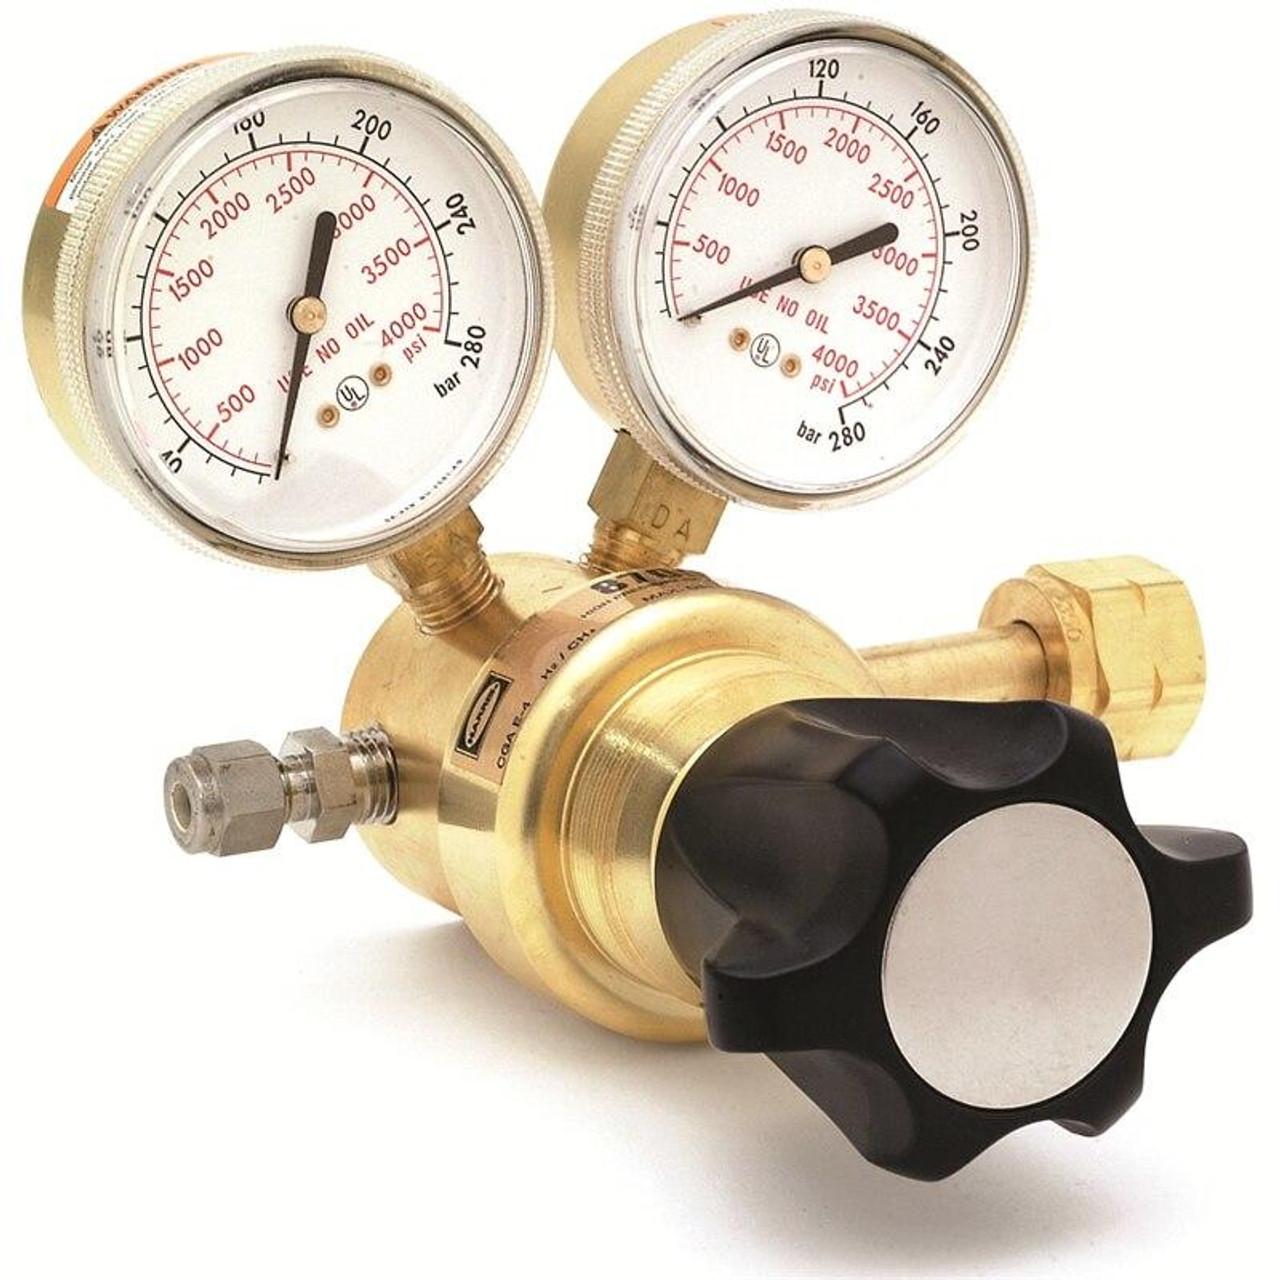 Harris Model 8700-2500-580 Argon, Helium, Nitrogen Ultra High Delivery Pressure Regulator - 3200301